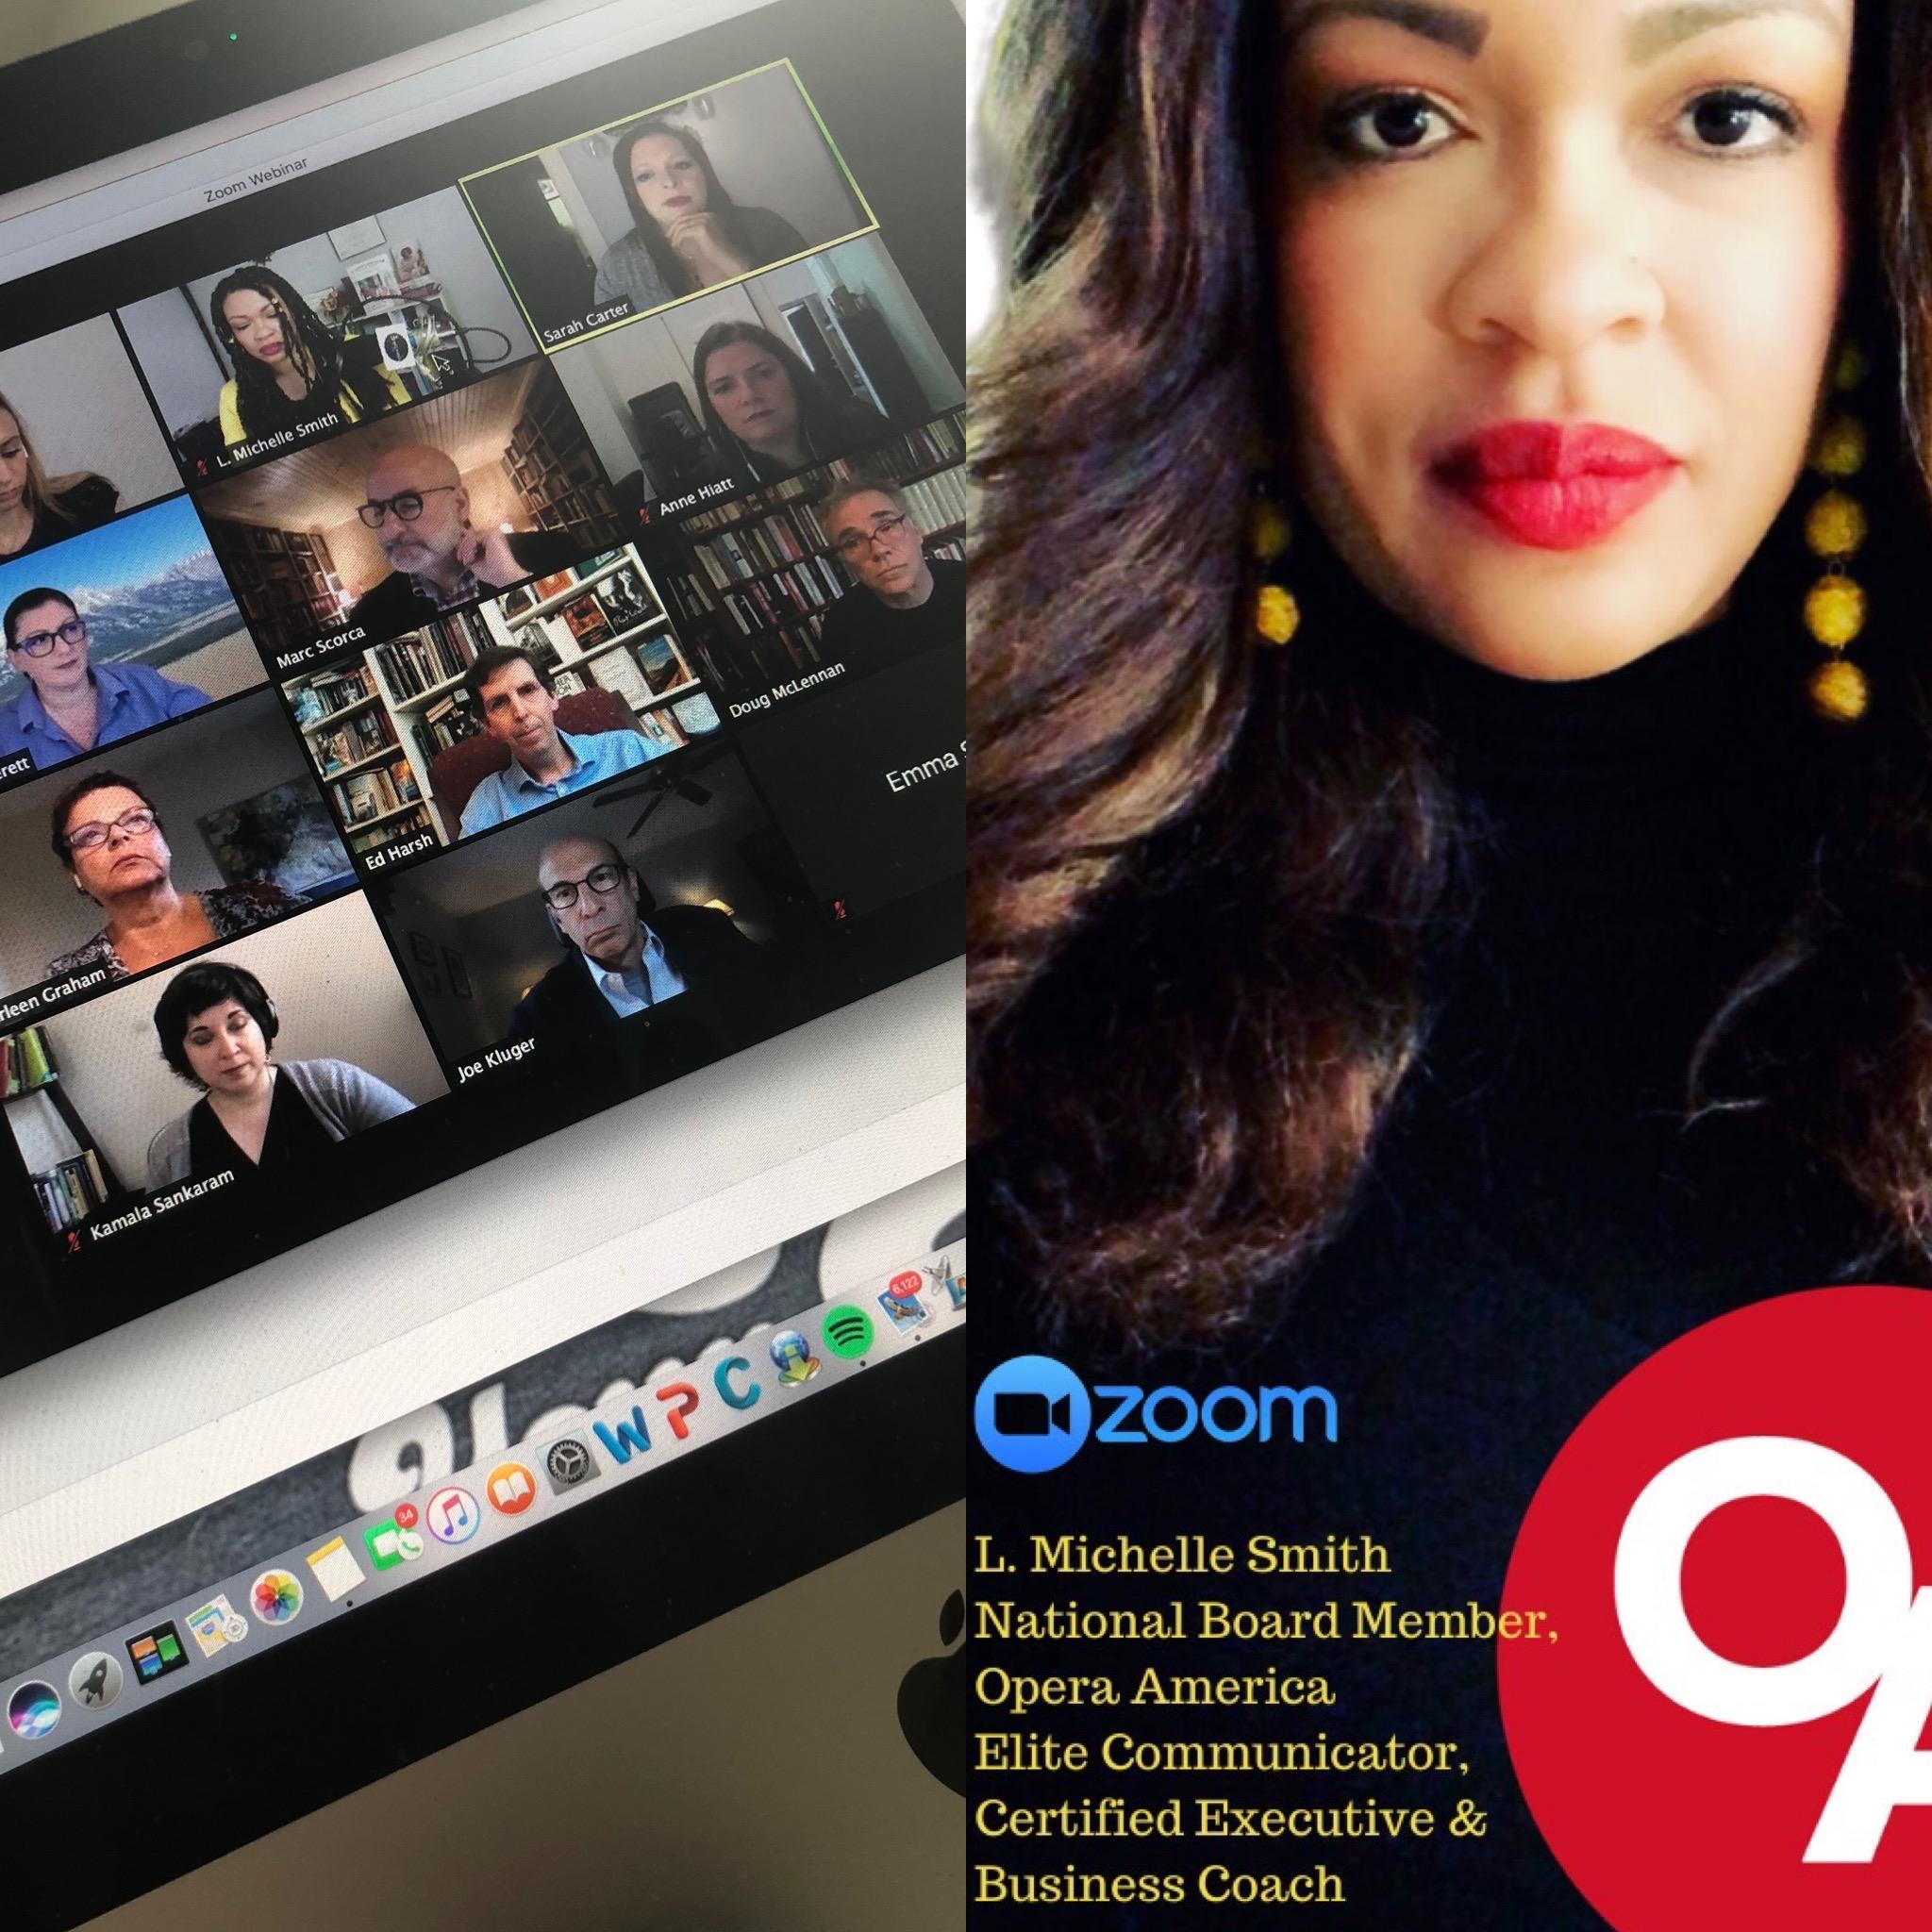 Ep 98: Leading with Tech in Opera, Marc Scorca CEO Opera America et al